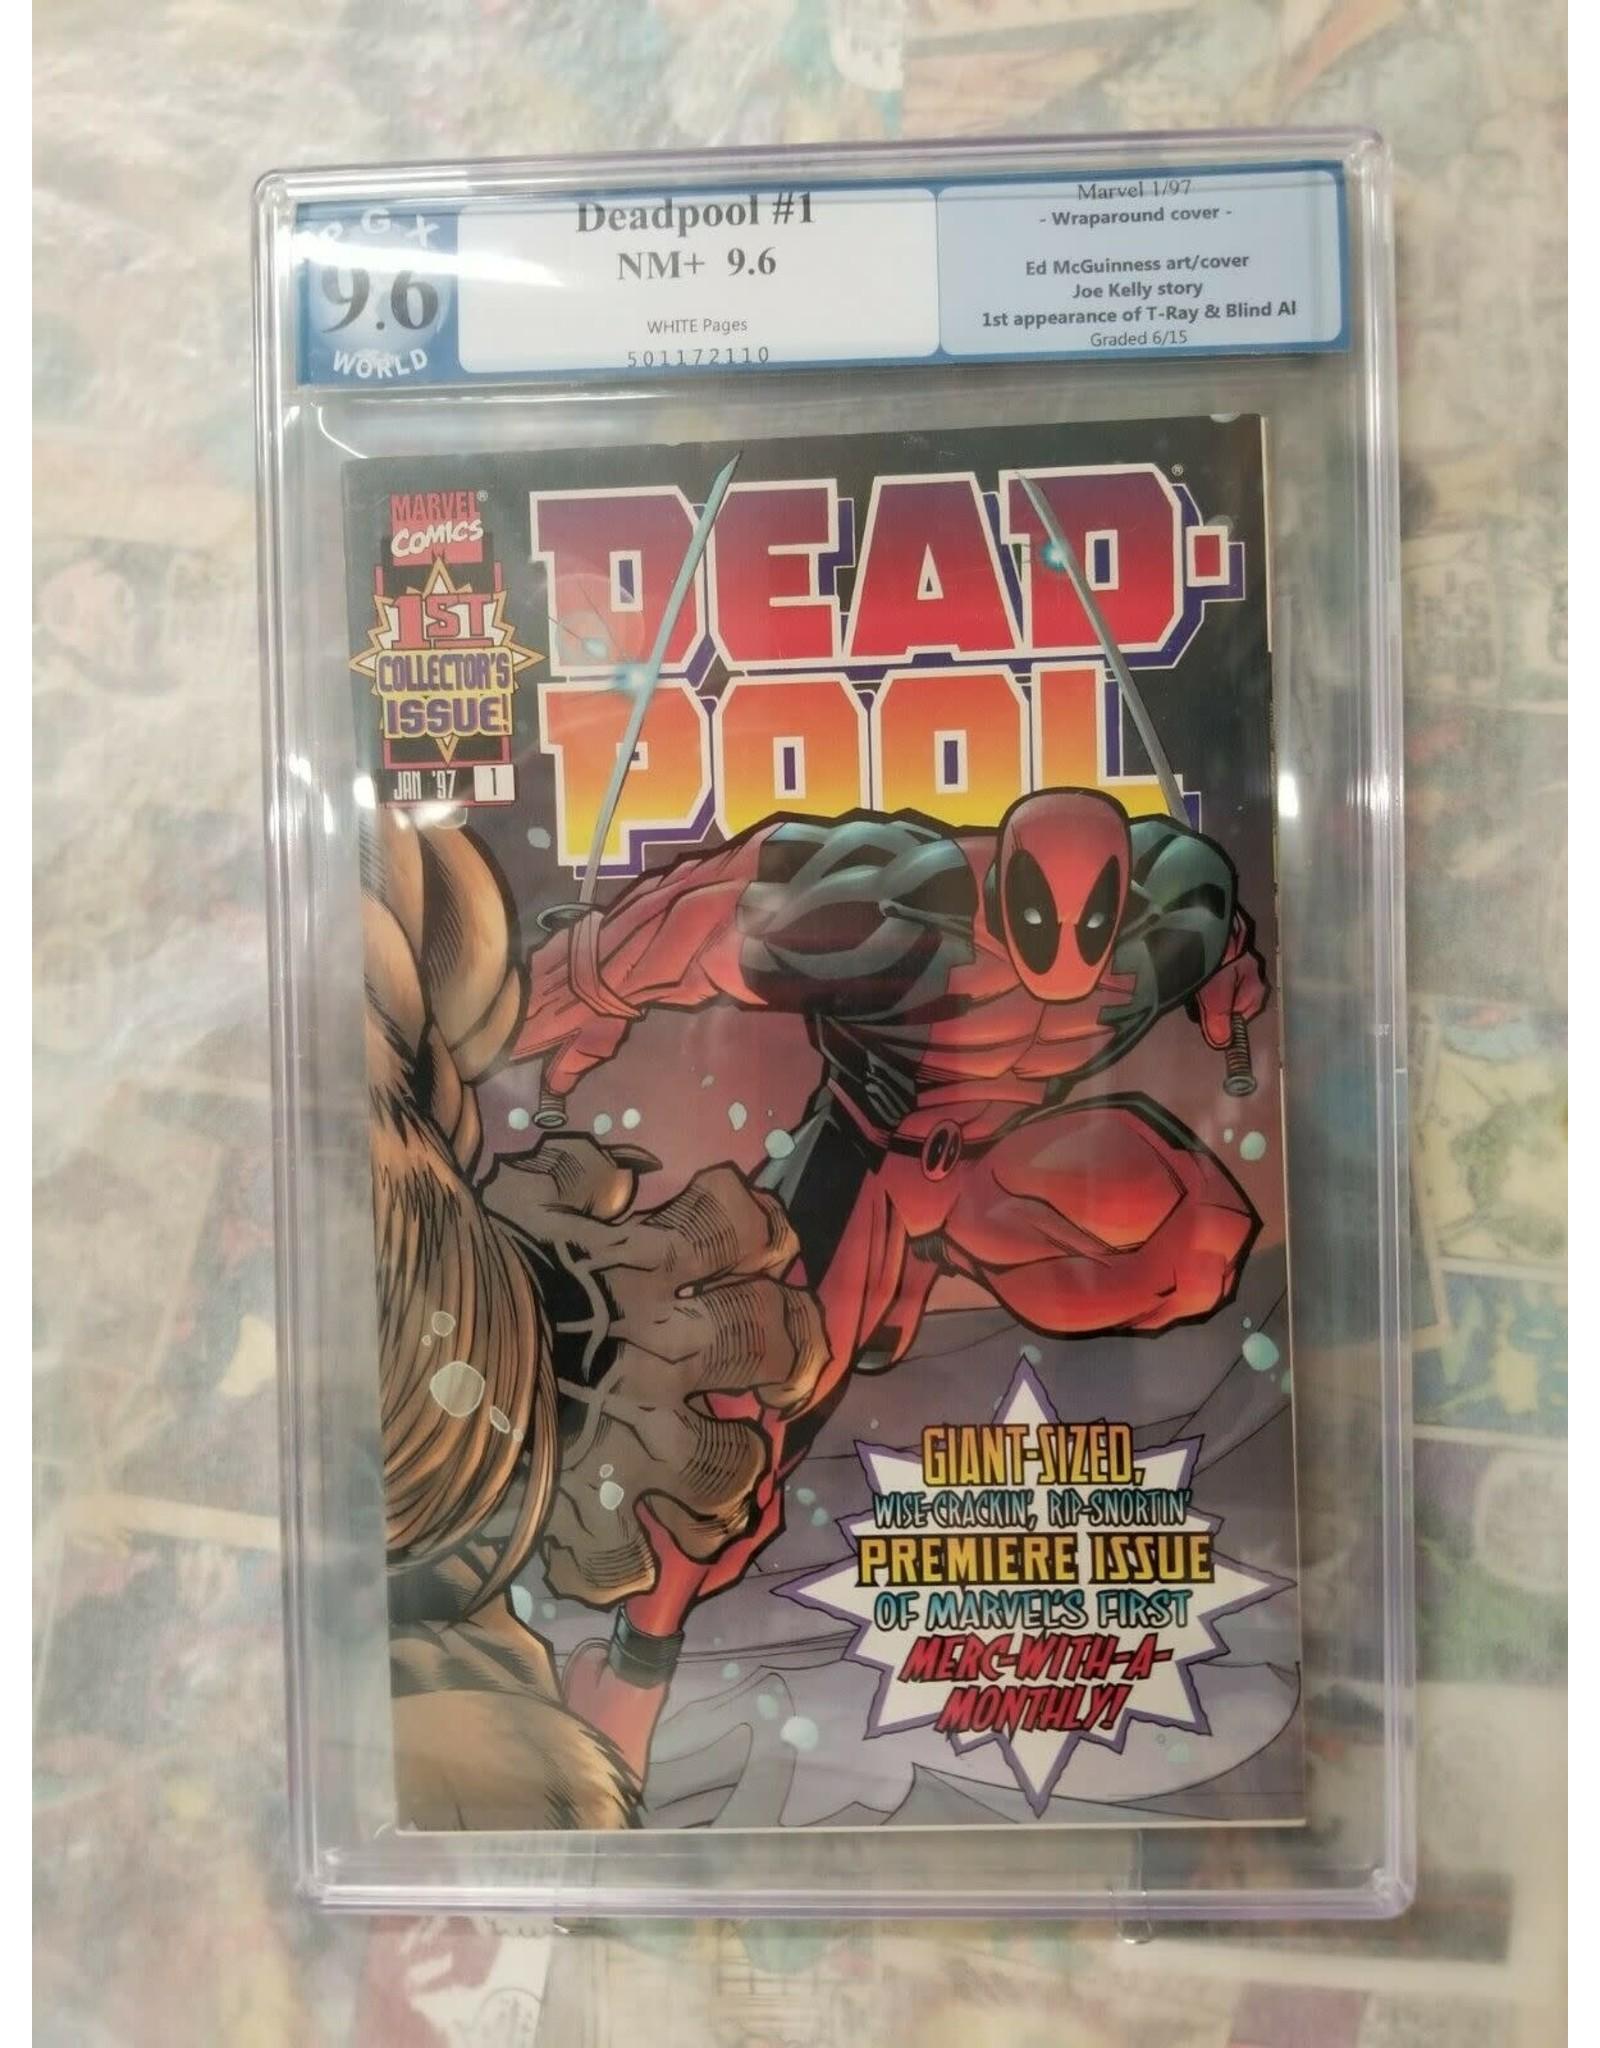 Marvel Comics Deadpool #1 1997 PGX 9.6 1st Solo series, 1st T-Ray and Blind Al